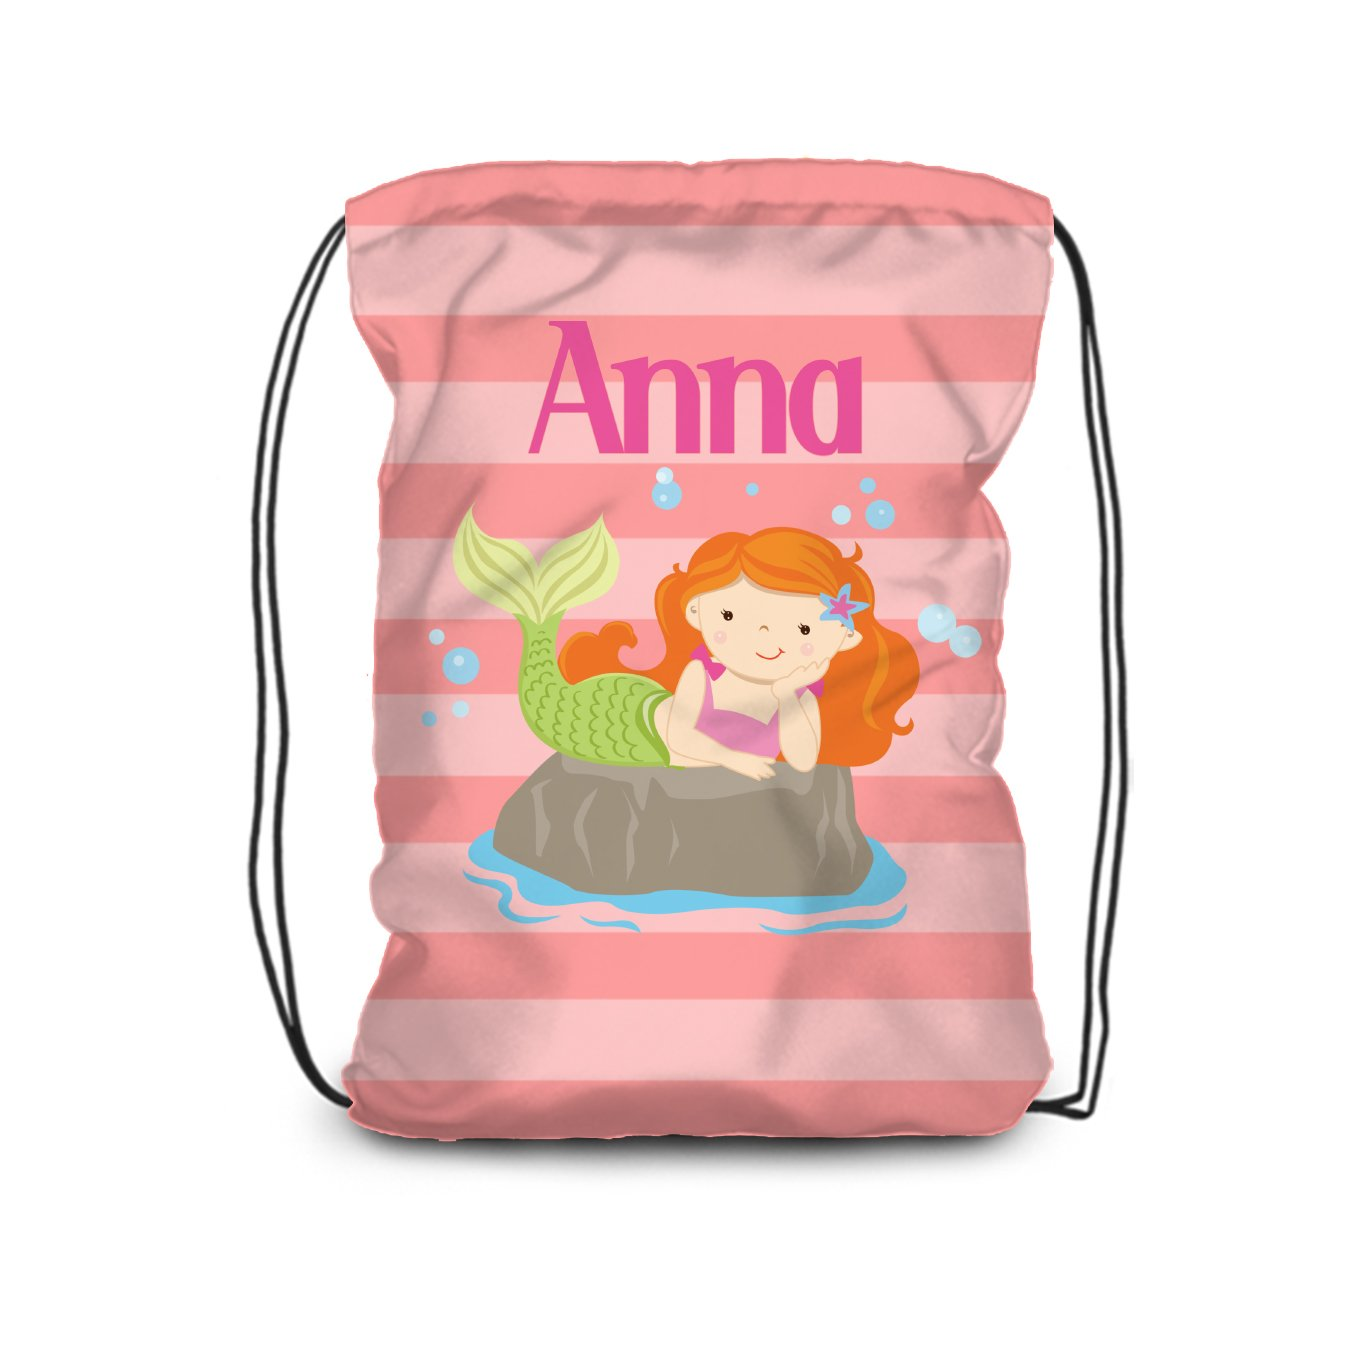 Mermaid Drawstring Backpack - Coral Max 51% OFF Bag Large-scale sale Stripe